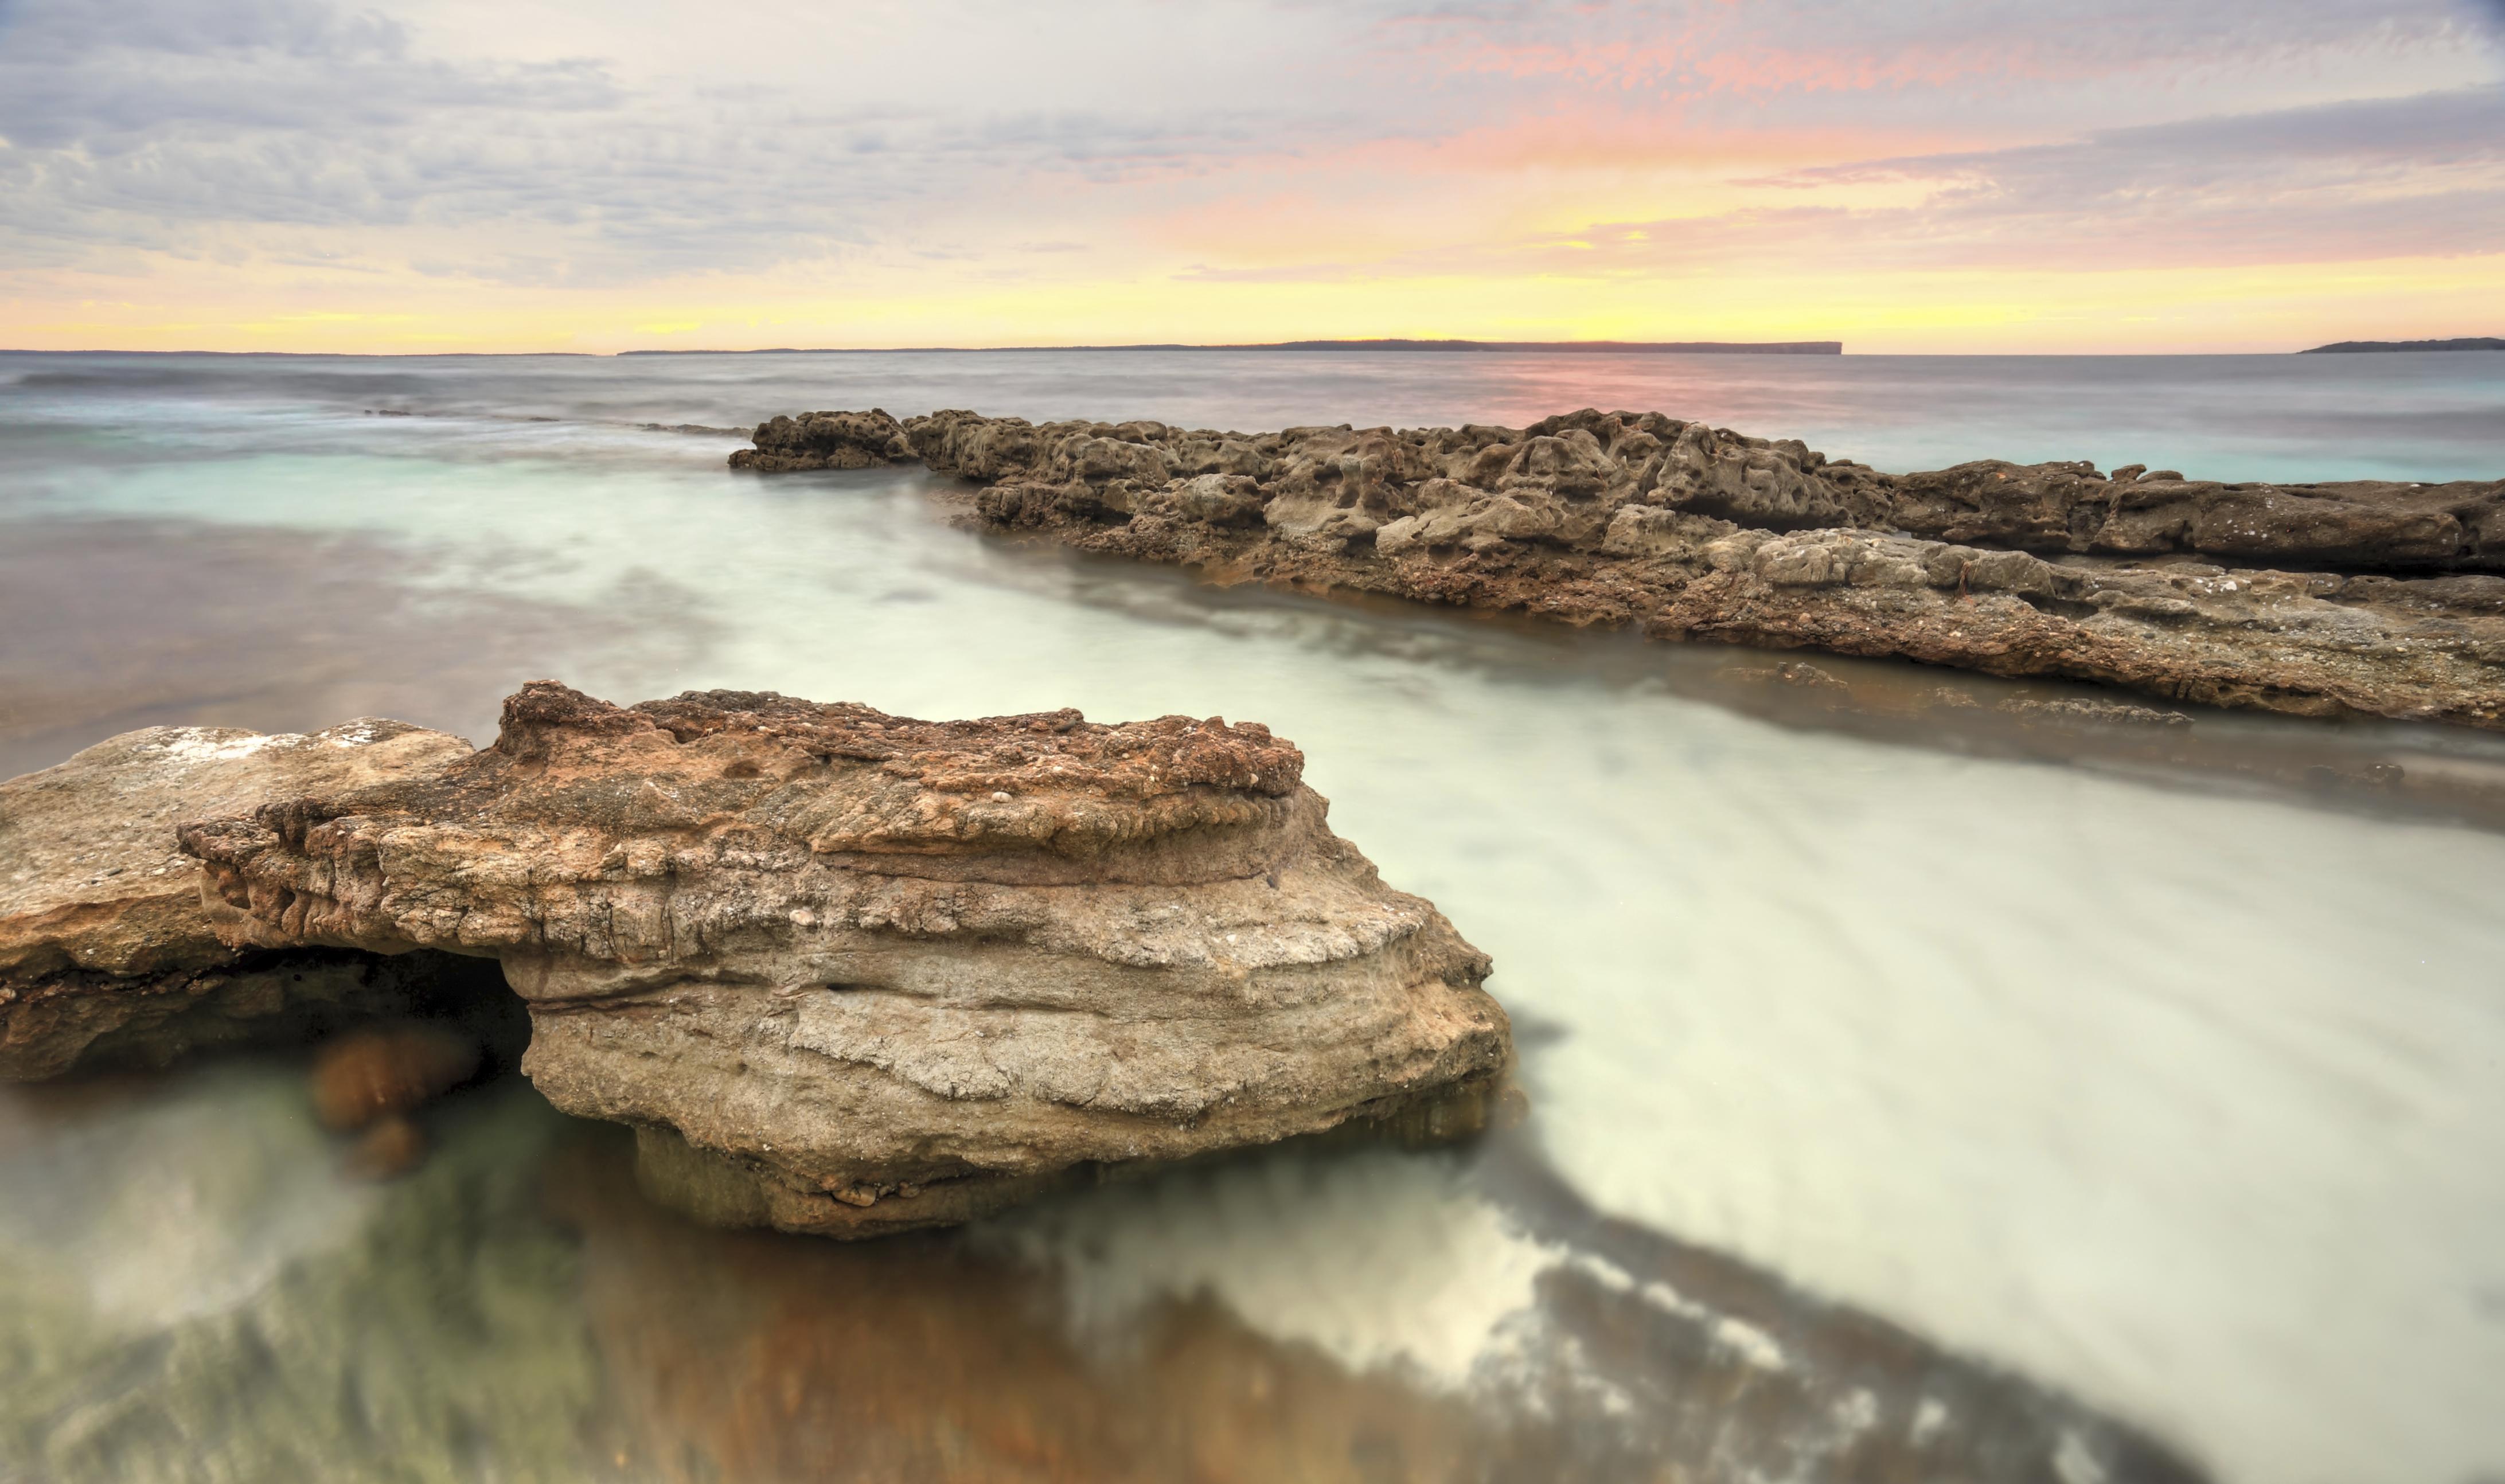 Soft pastel colours of a sunrise at hyams beach australia   istock 000044921584 large